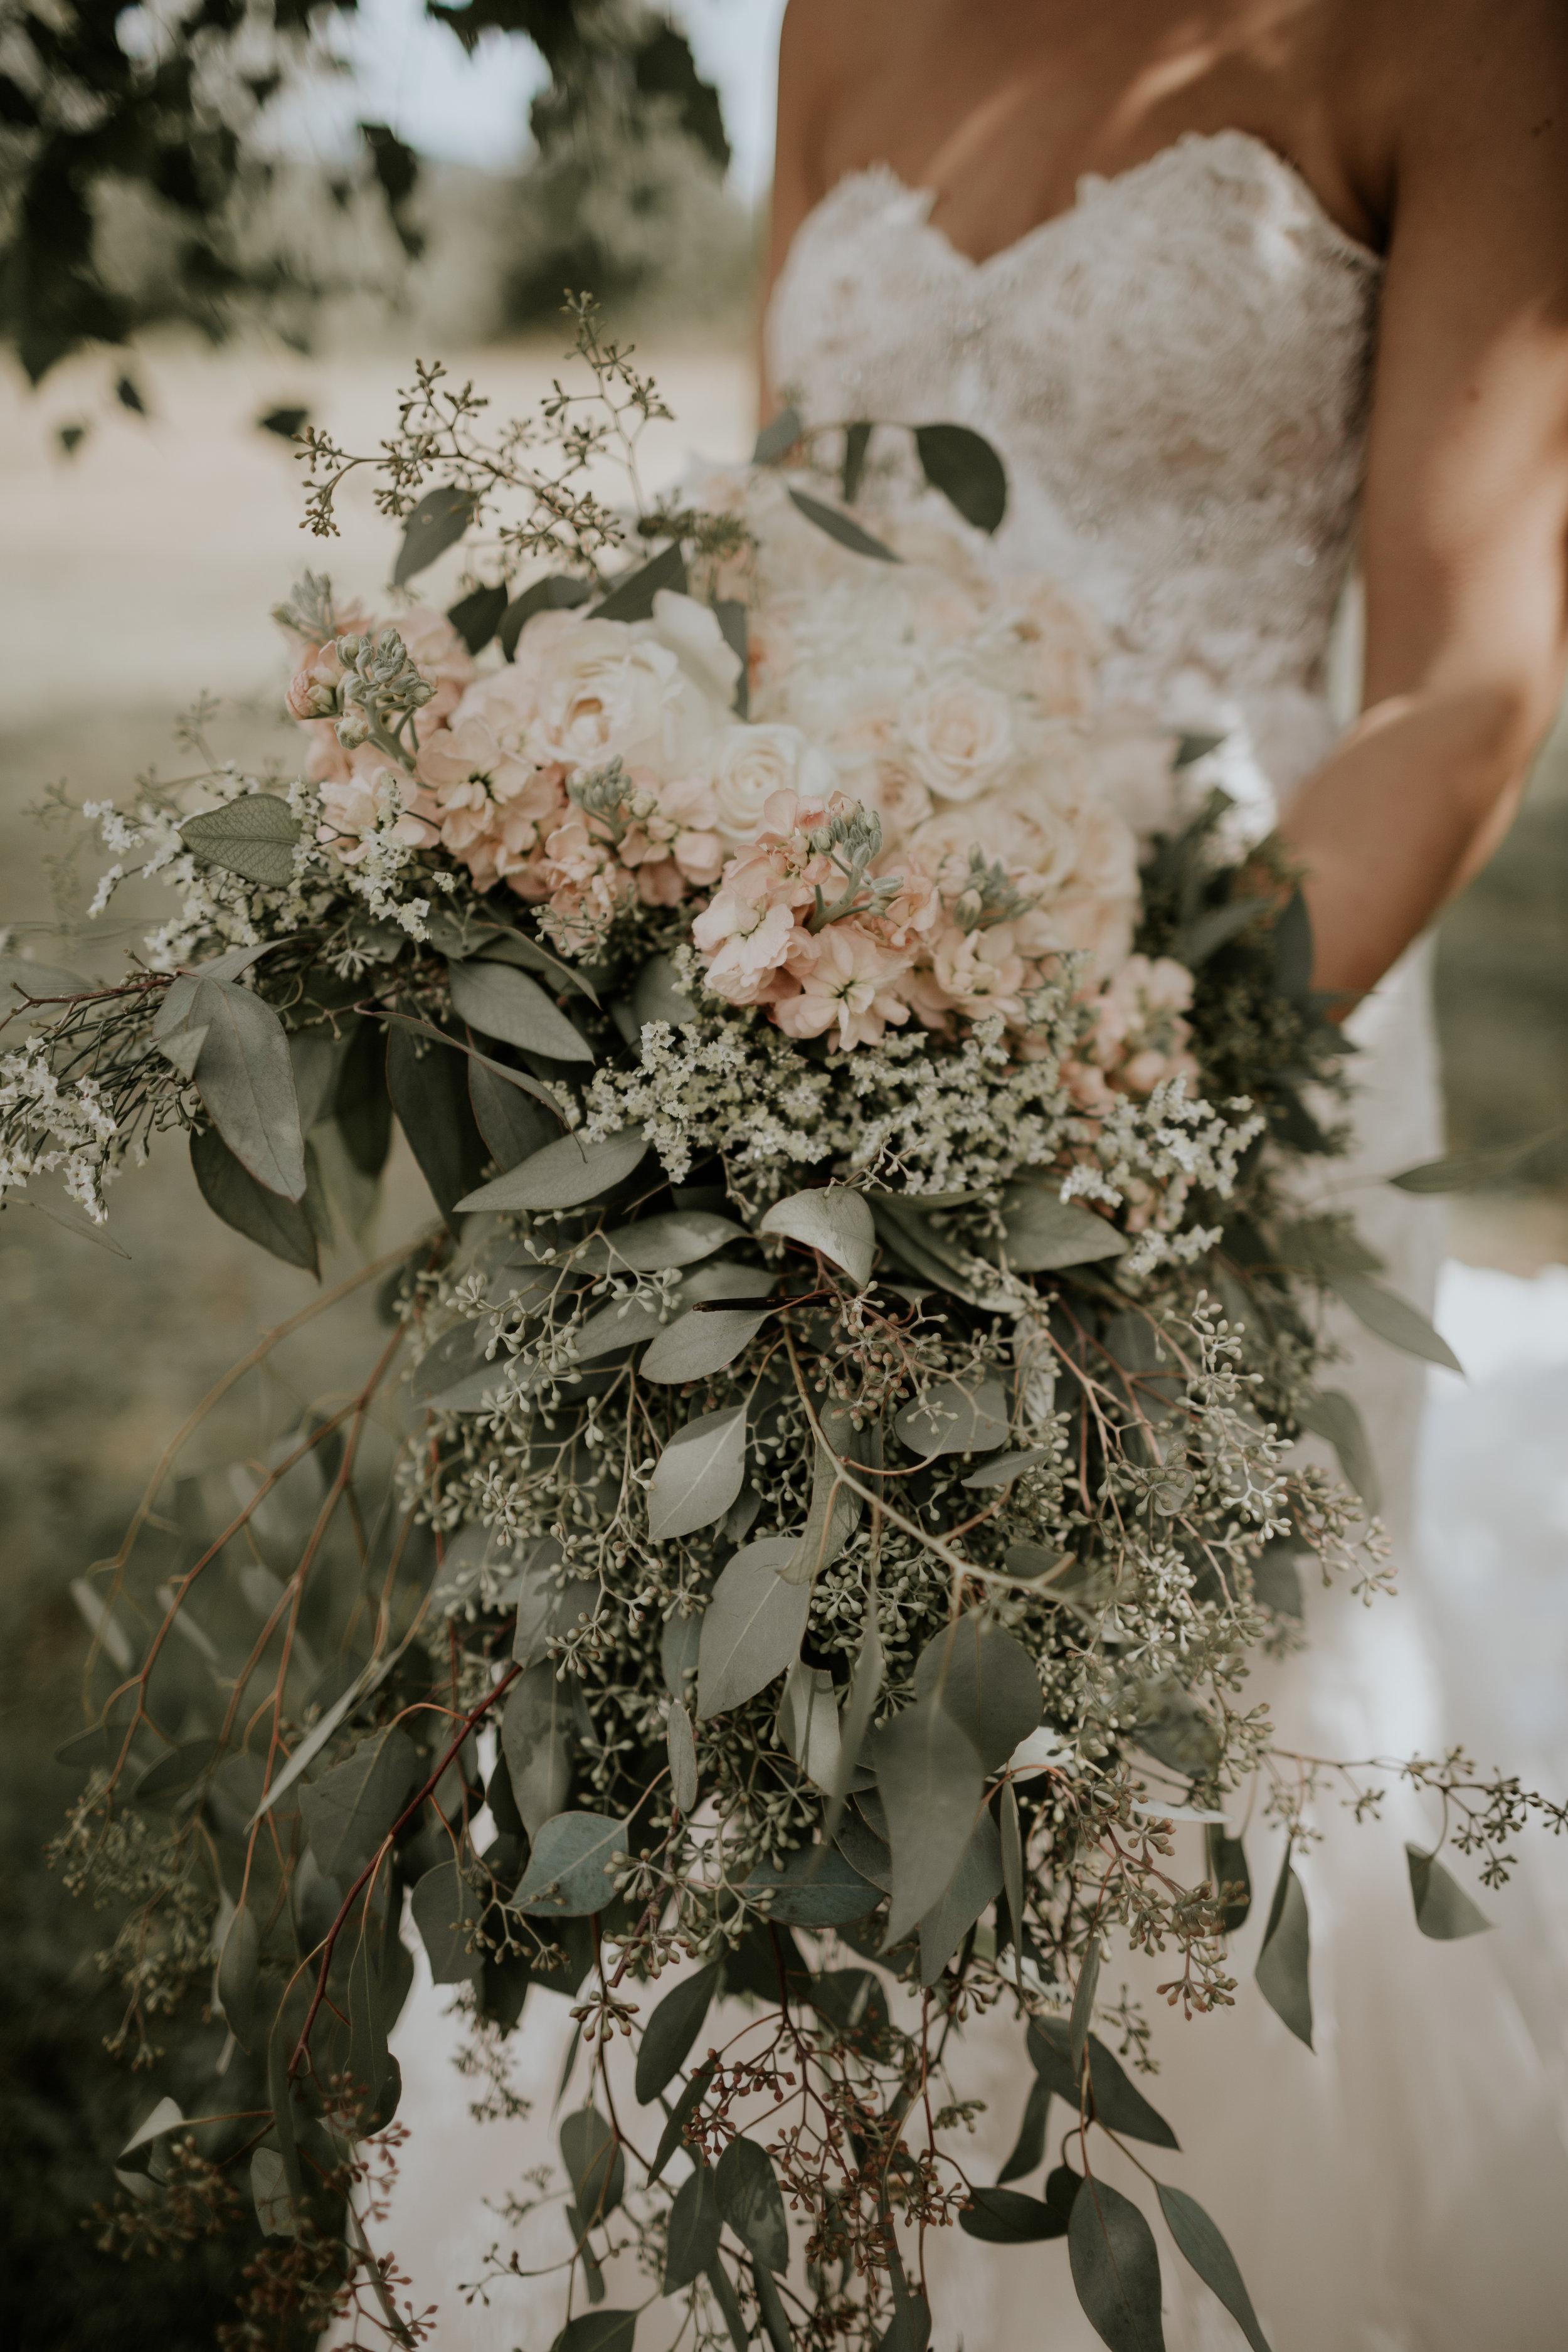 Olympic-Peninsula-Wedding-Photographer-PNW-Forks-Port-Angeles-Kayla-Dawn-Photography-engagement-Olympic-National-Park-120.jpg